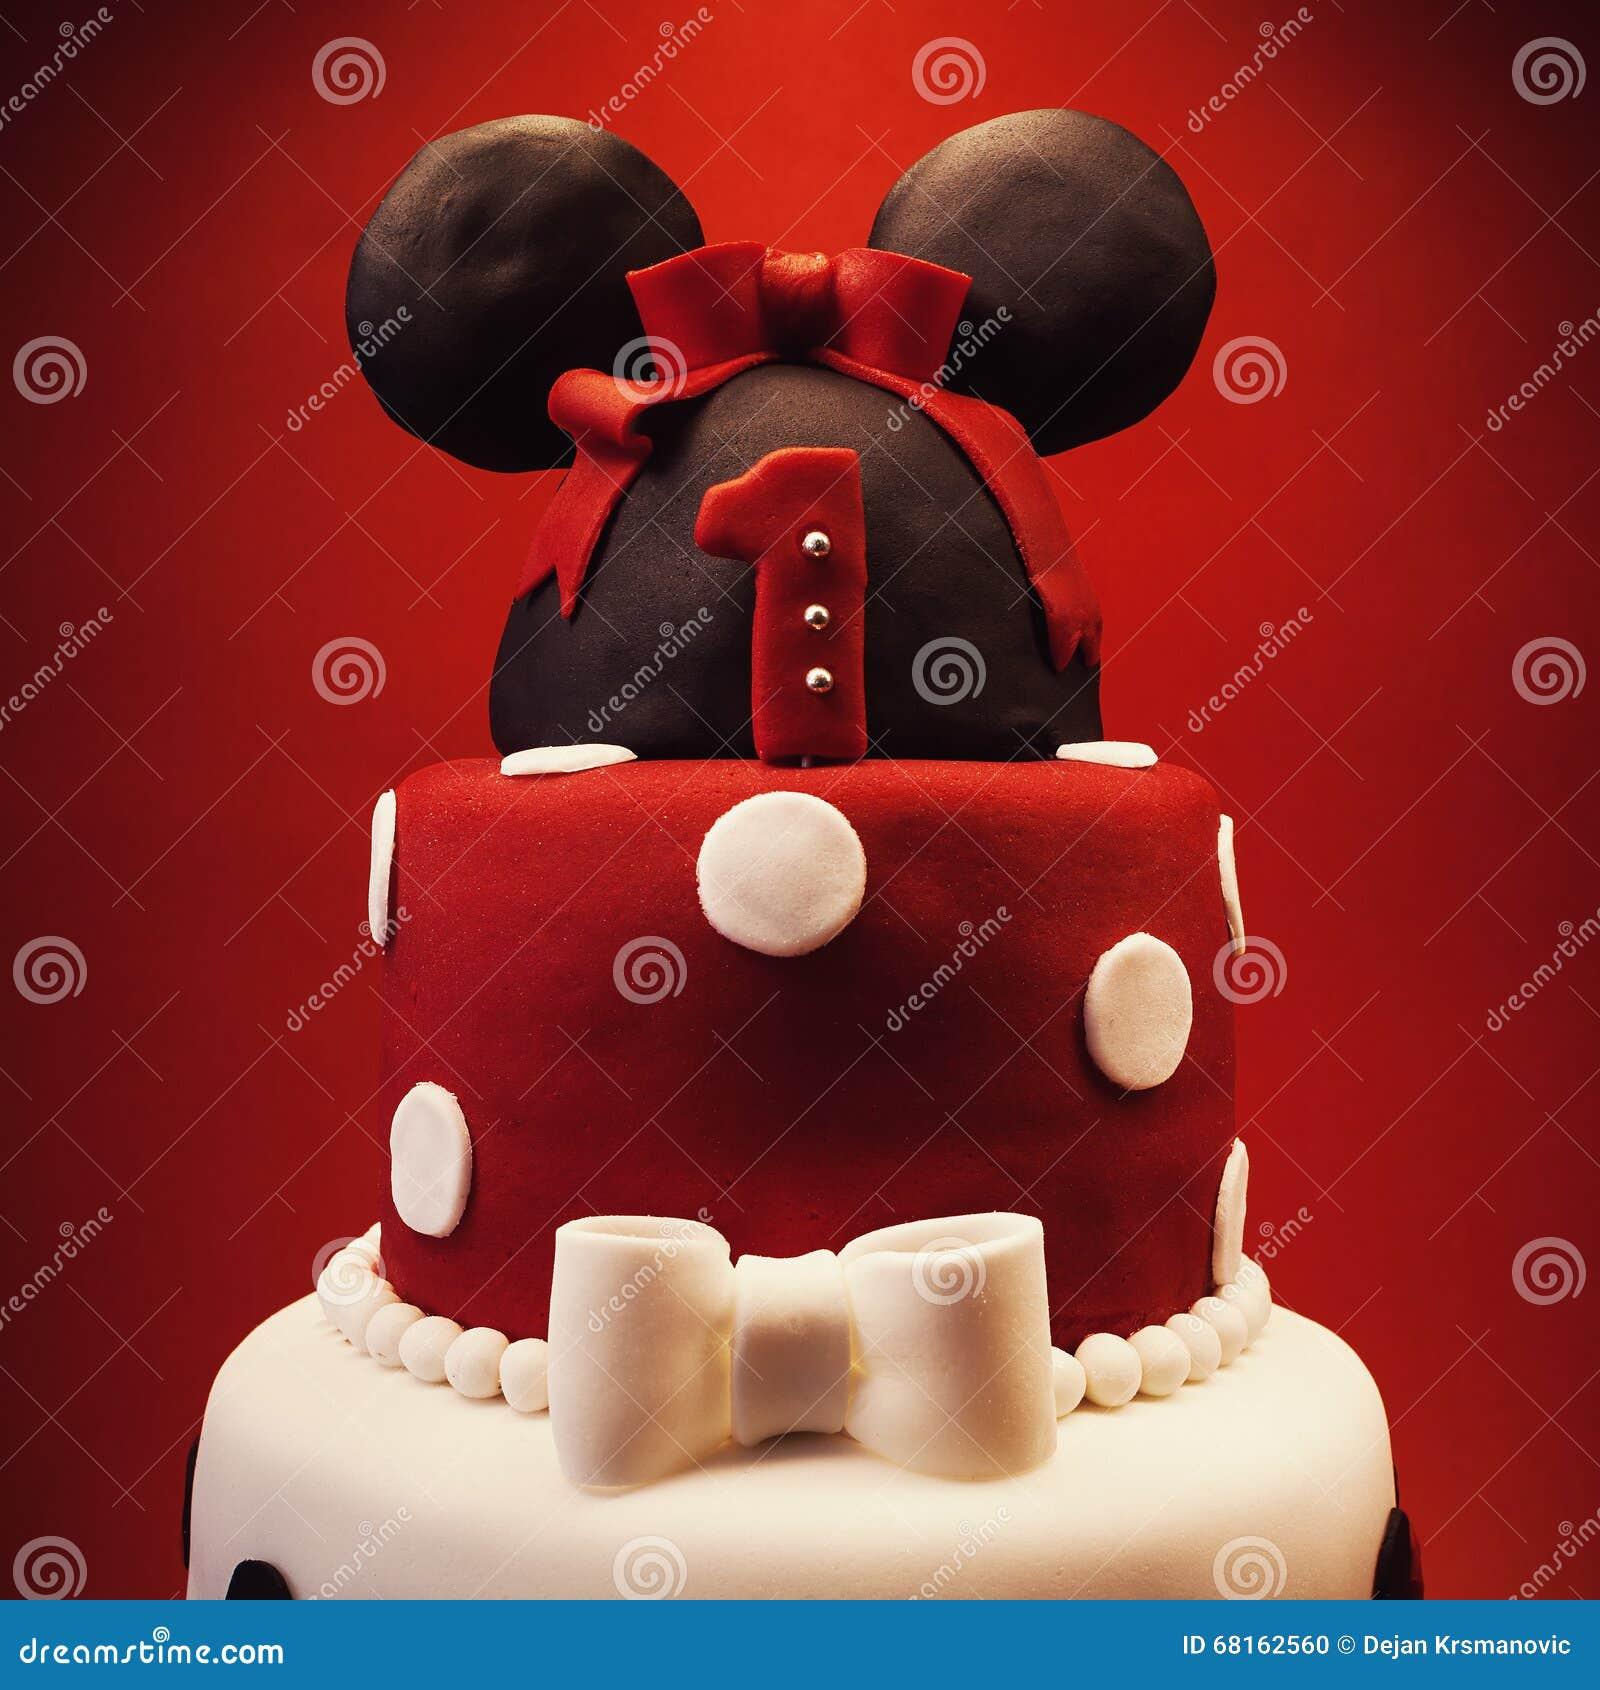 Birthday Cake For Baby Girl Stock Photo Image Of Conceptual